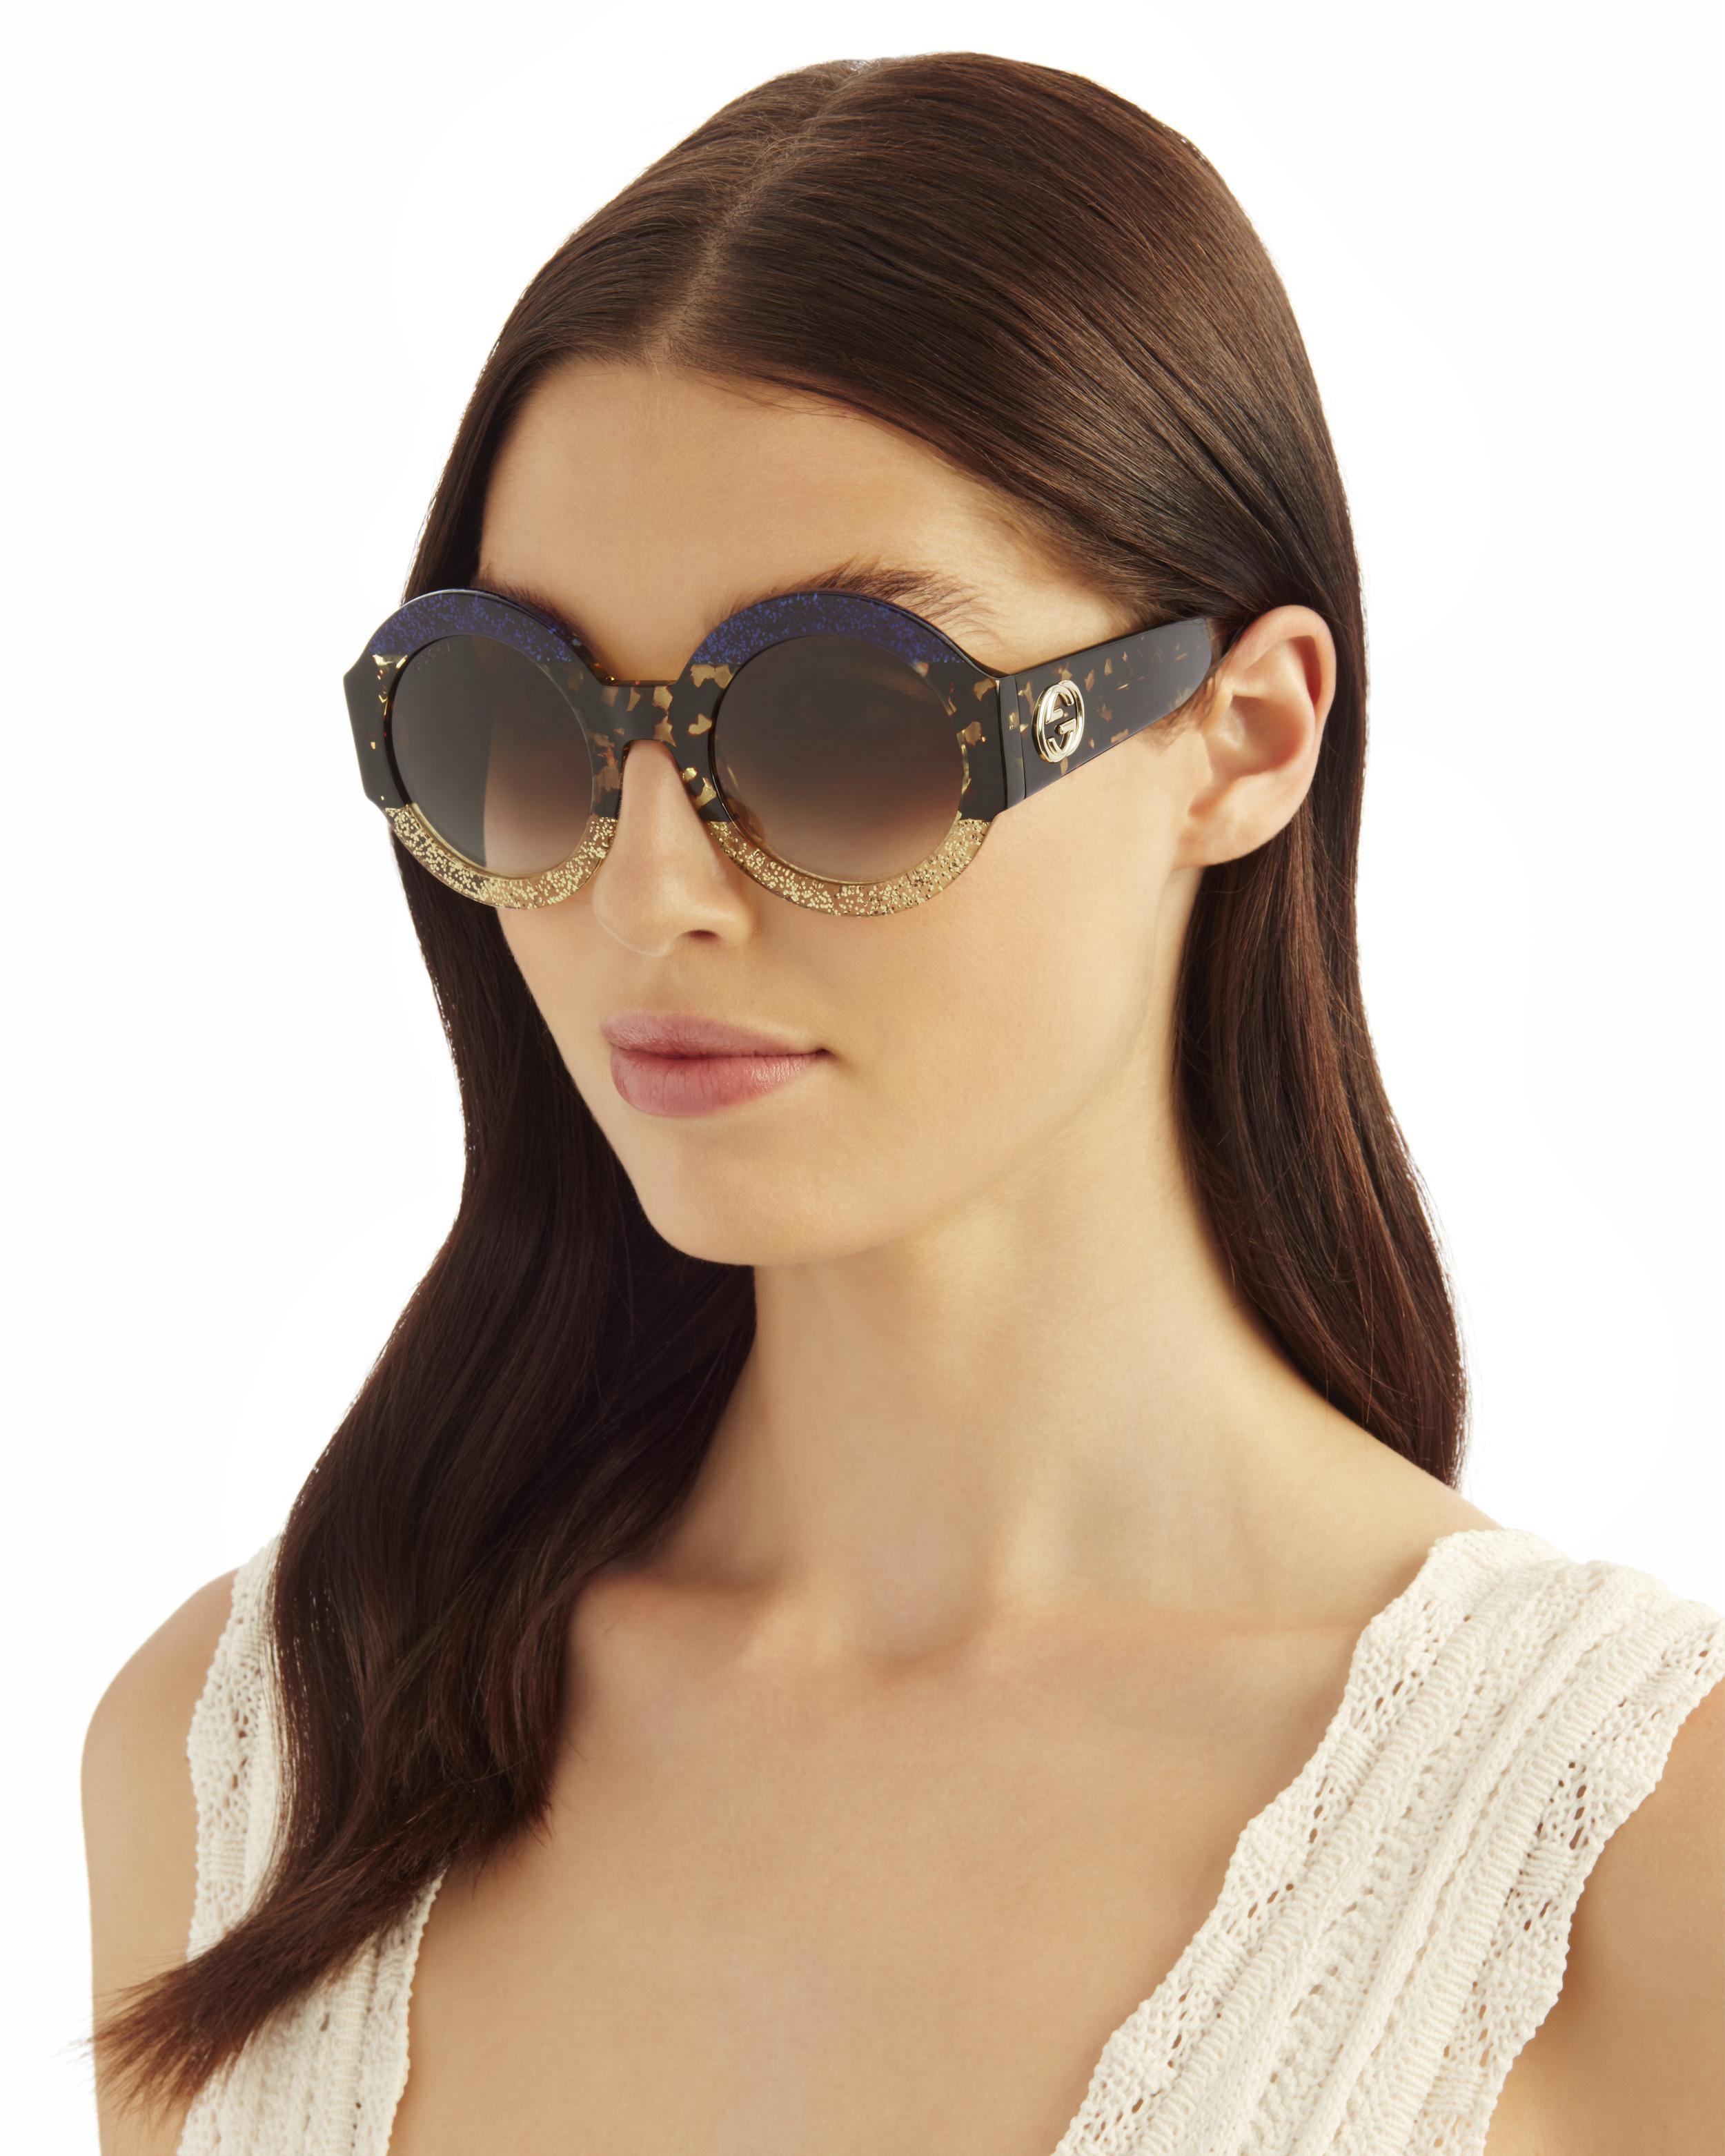 cc9ddf70373a Gucci Oversized Colorblock Glitter Round Sunglasses in Brown - Lyst